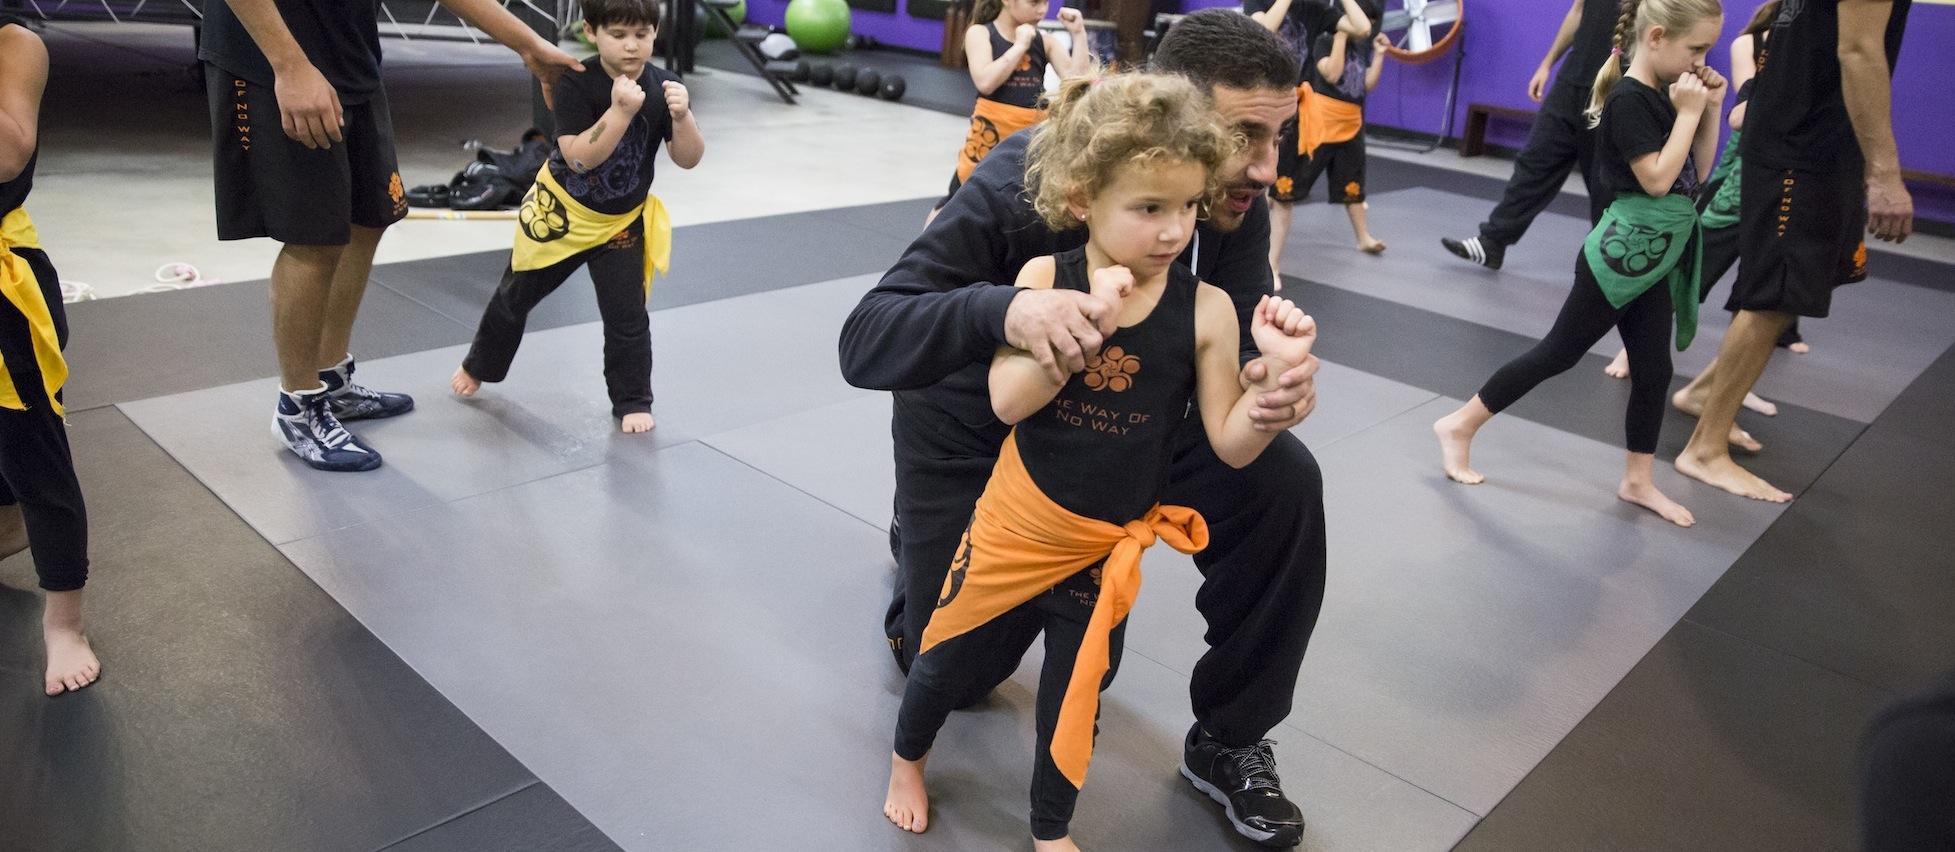 kids-martial-arts-los-angeles.jpg